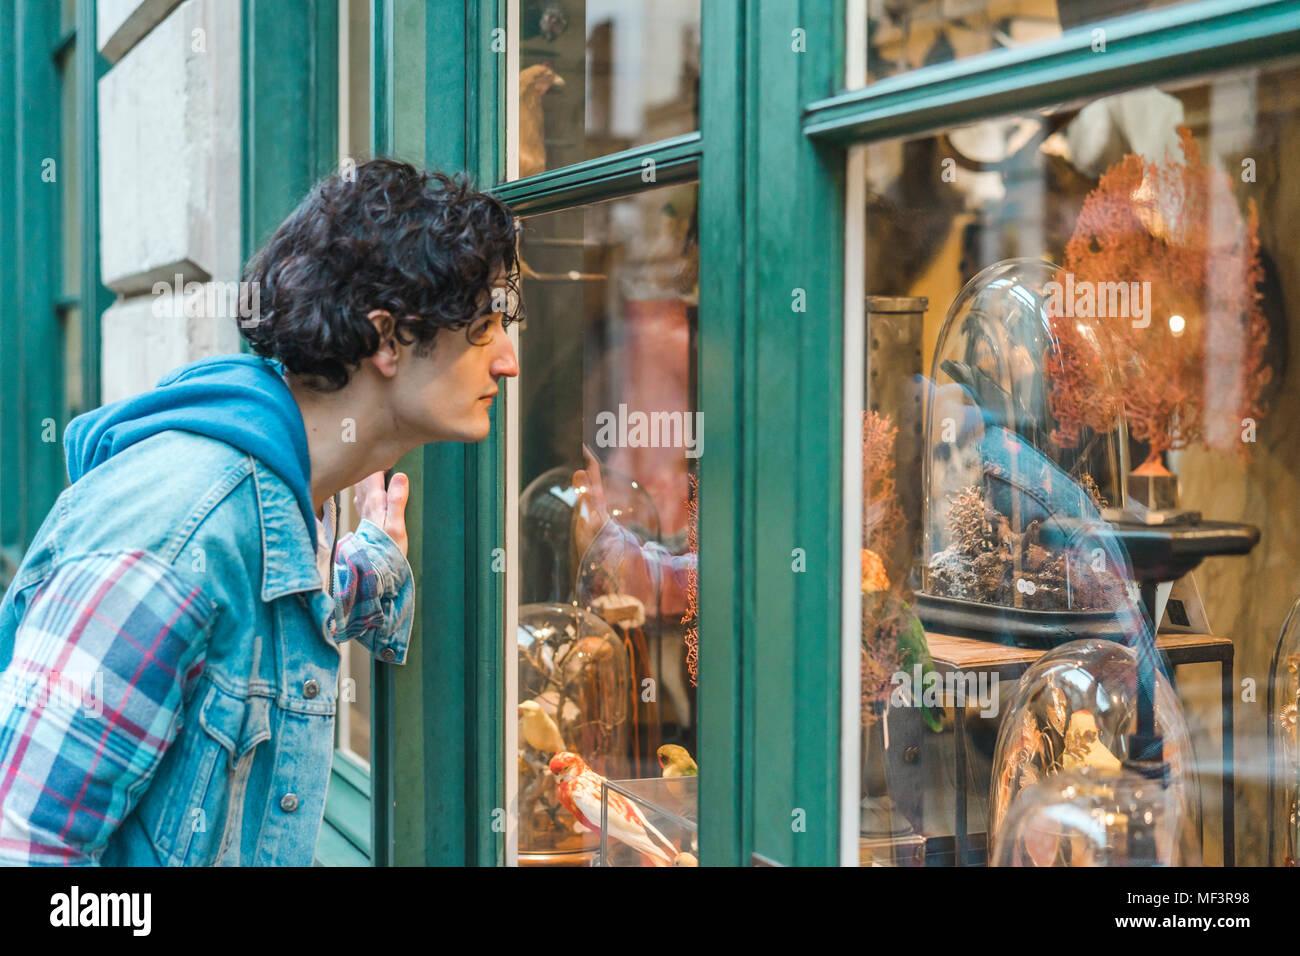 Retrato de joven mirando a través del cristal Imagen De Stock